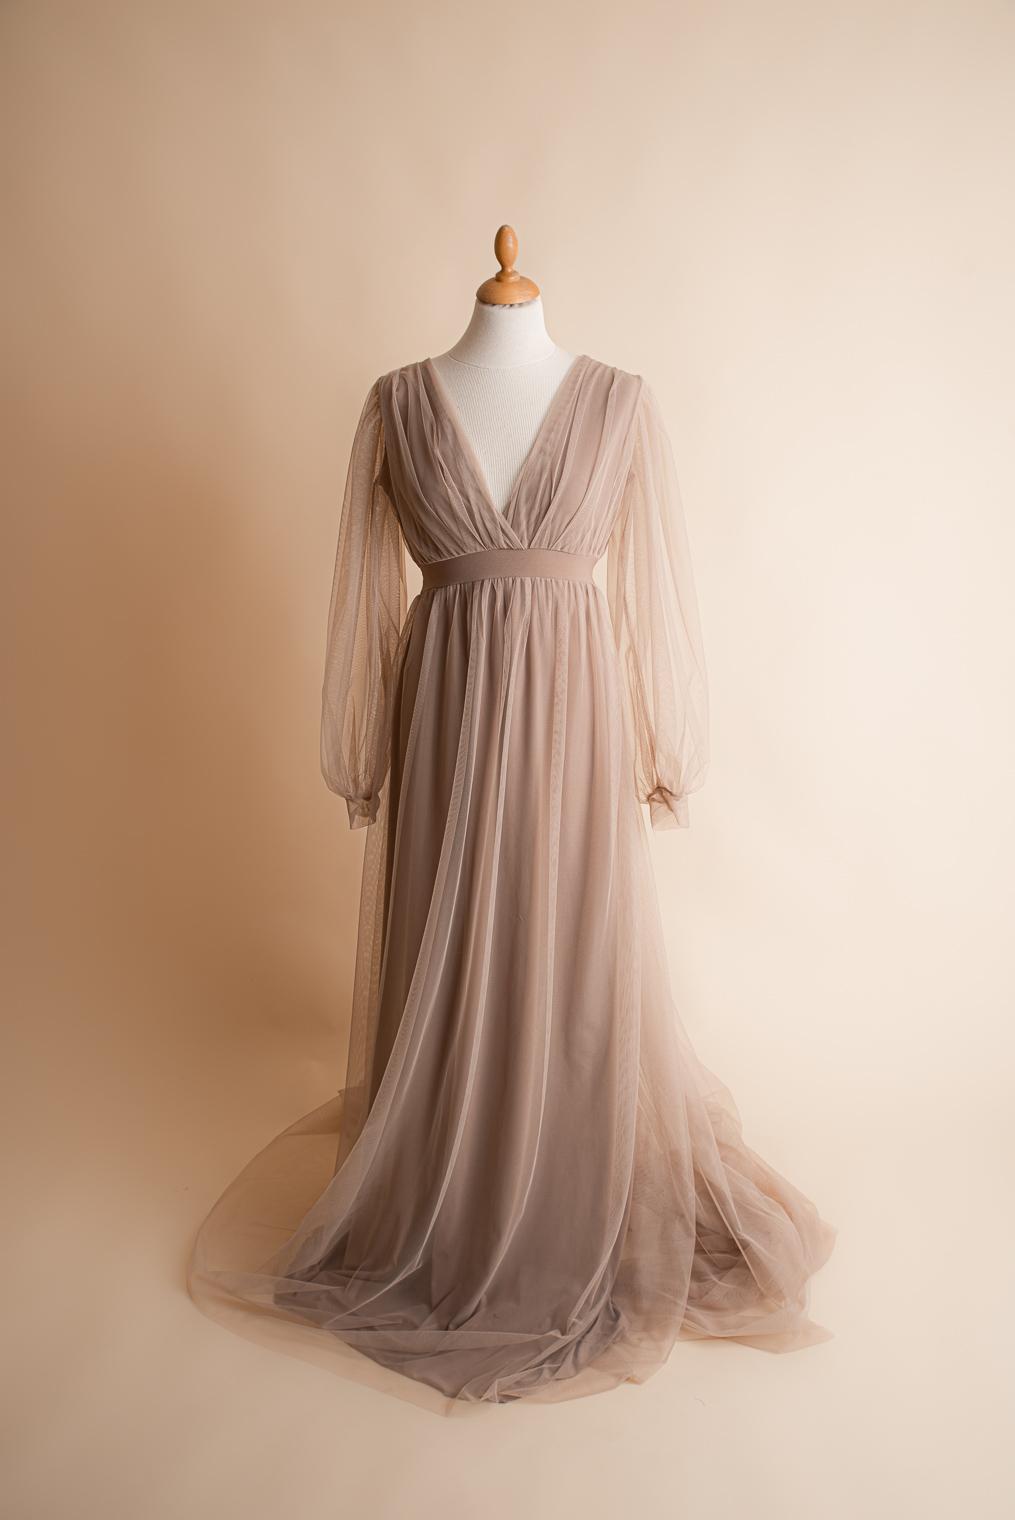 Tenues-Robes-Femme-Enceinte-Grossesse-Maman-Belinda-Lopez-Photographie-belindalopez.fr-6